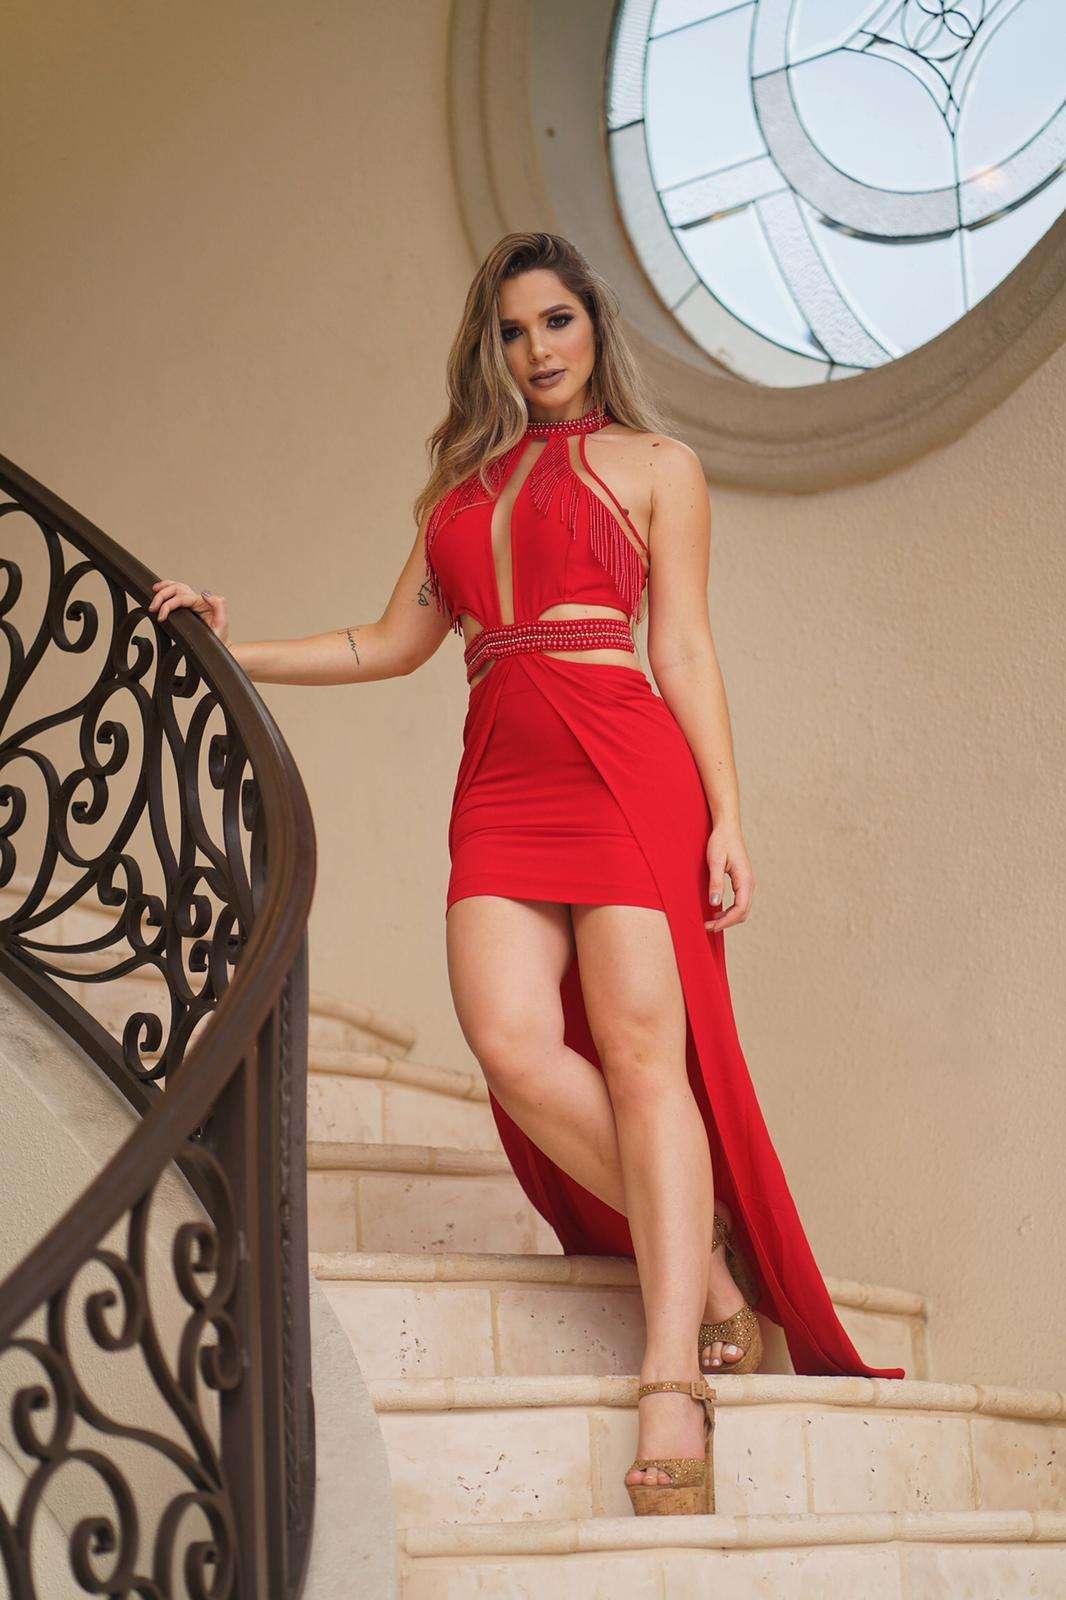 Modelo brasileira no New York Fashion Week